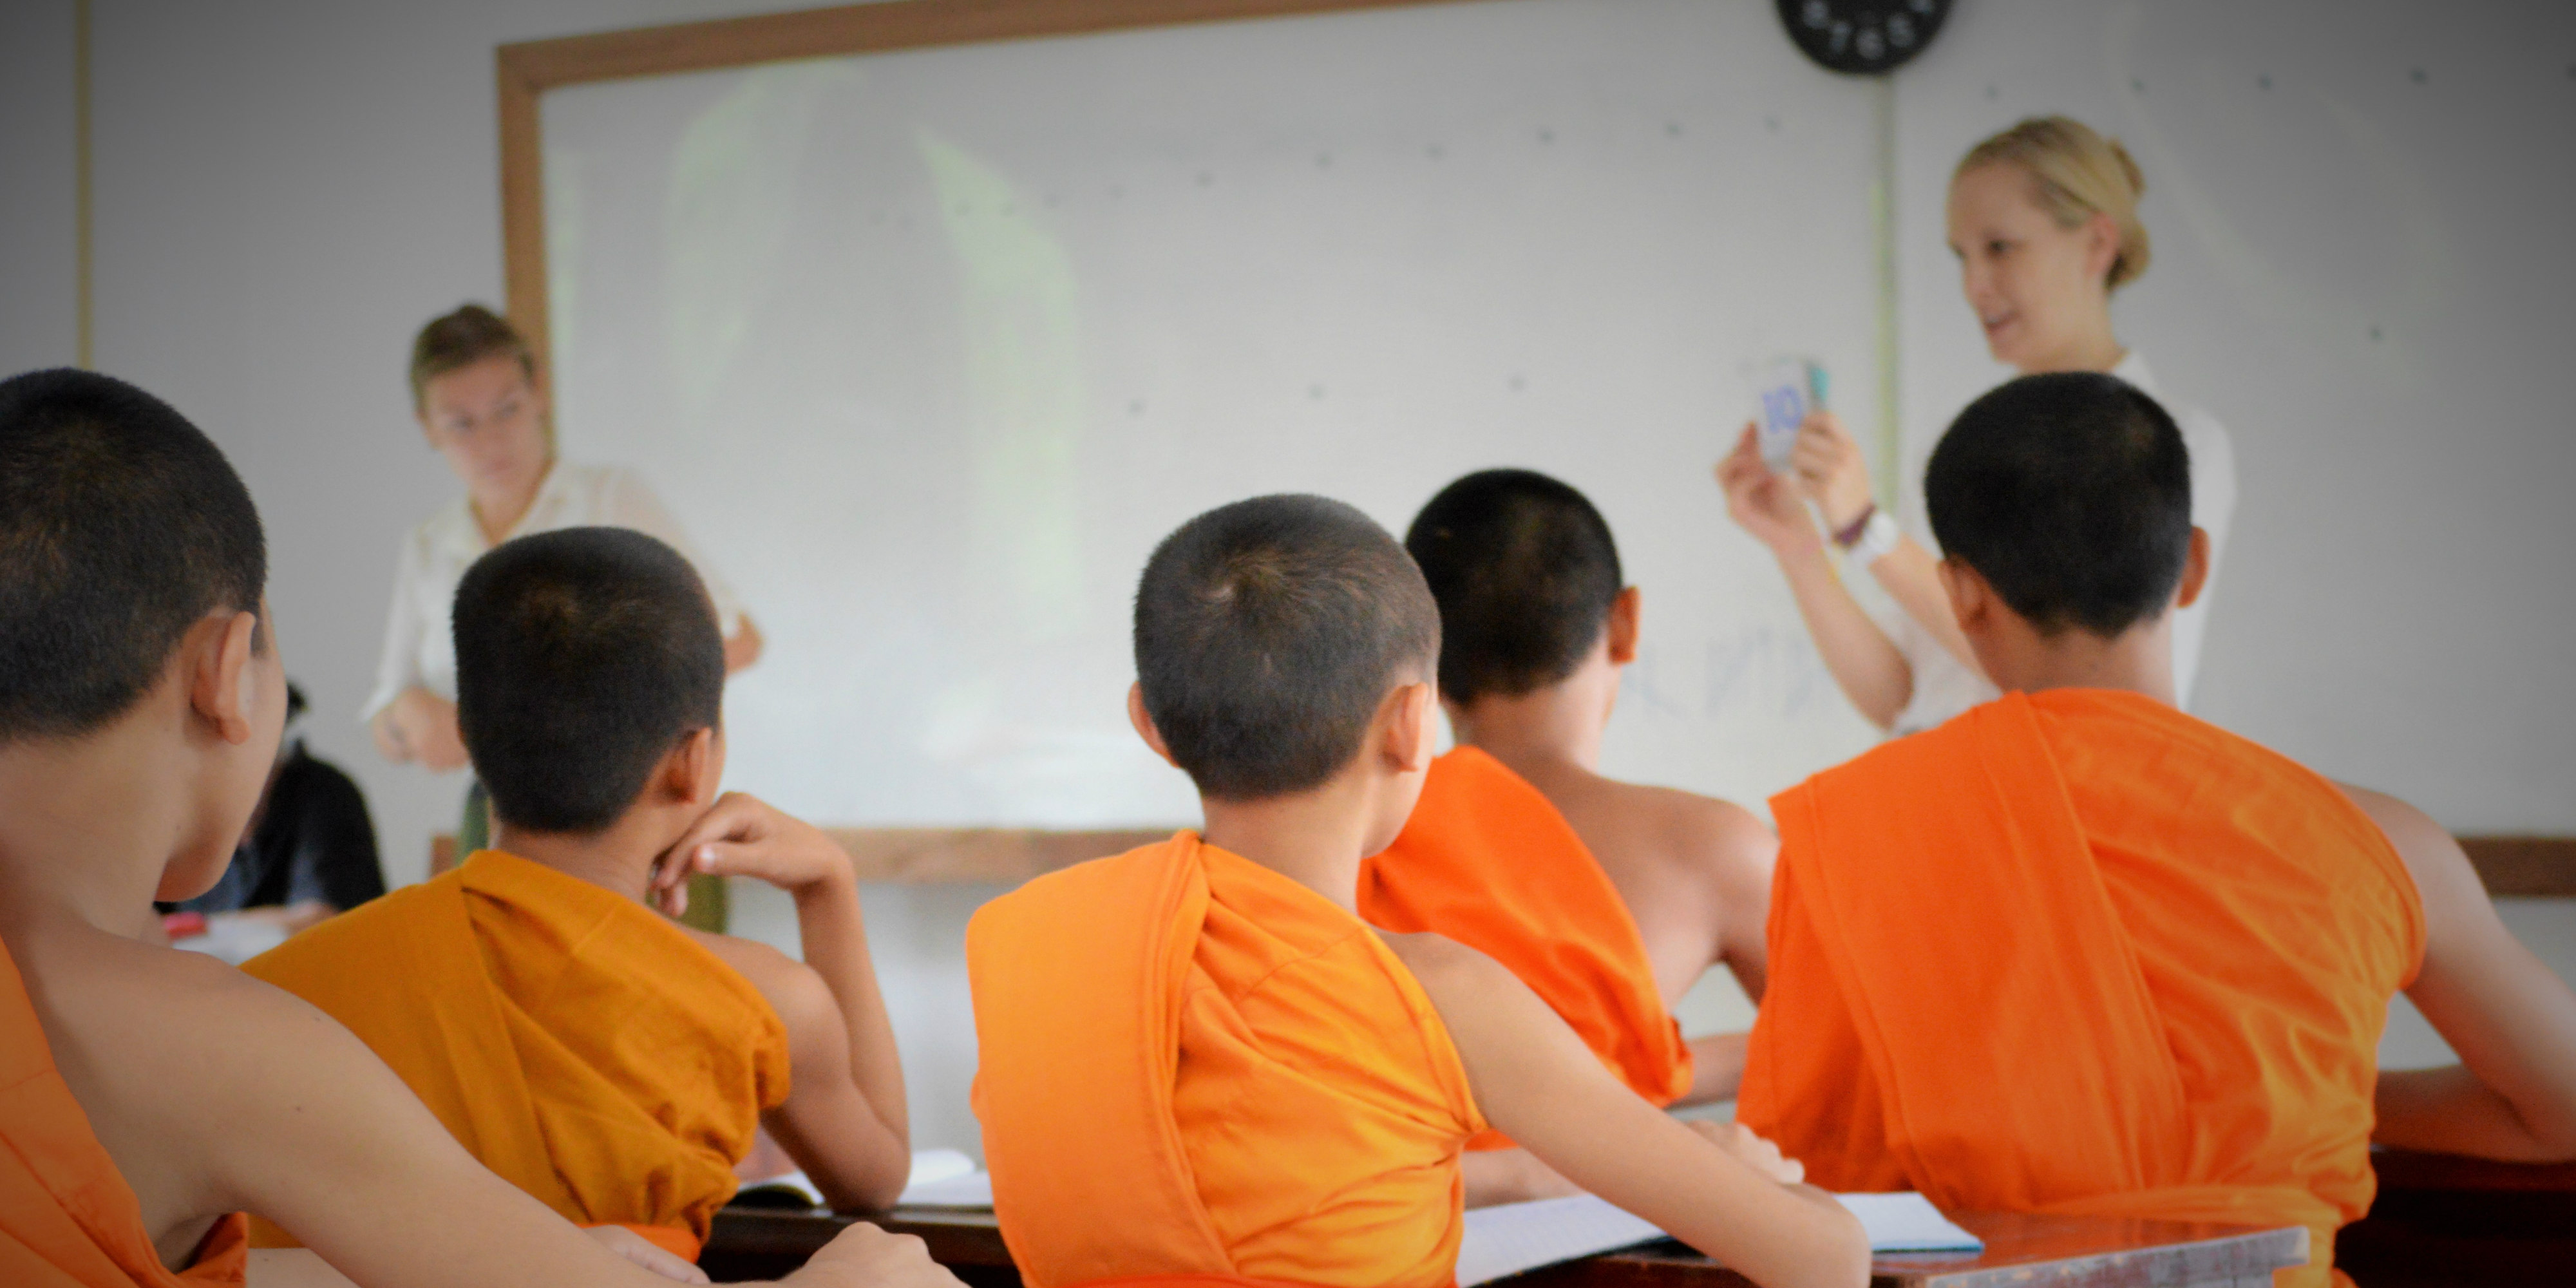 Volunteer experience looks good on your resume. Teaching English to novist Buddhist monks is an example of volunteer work.